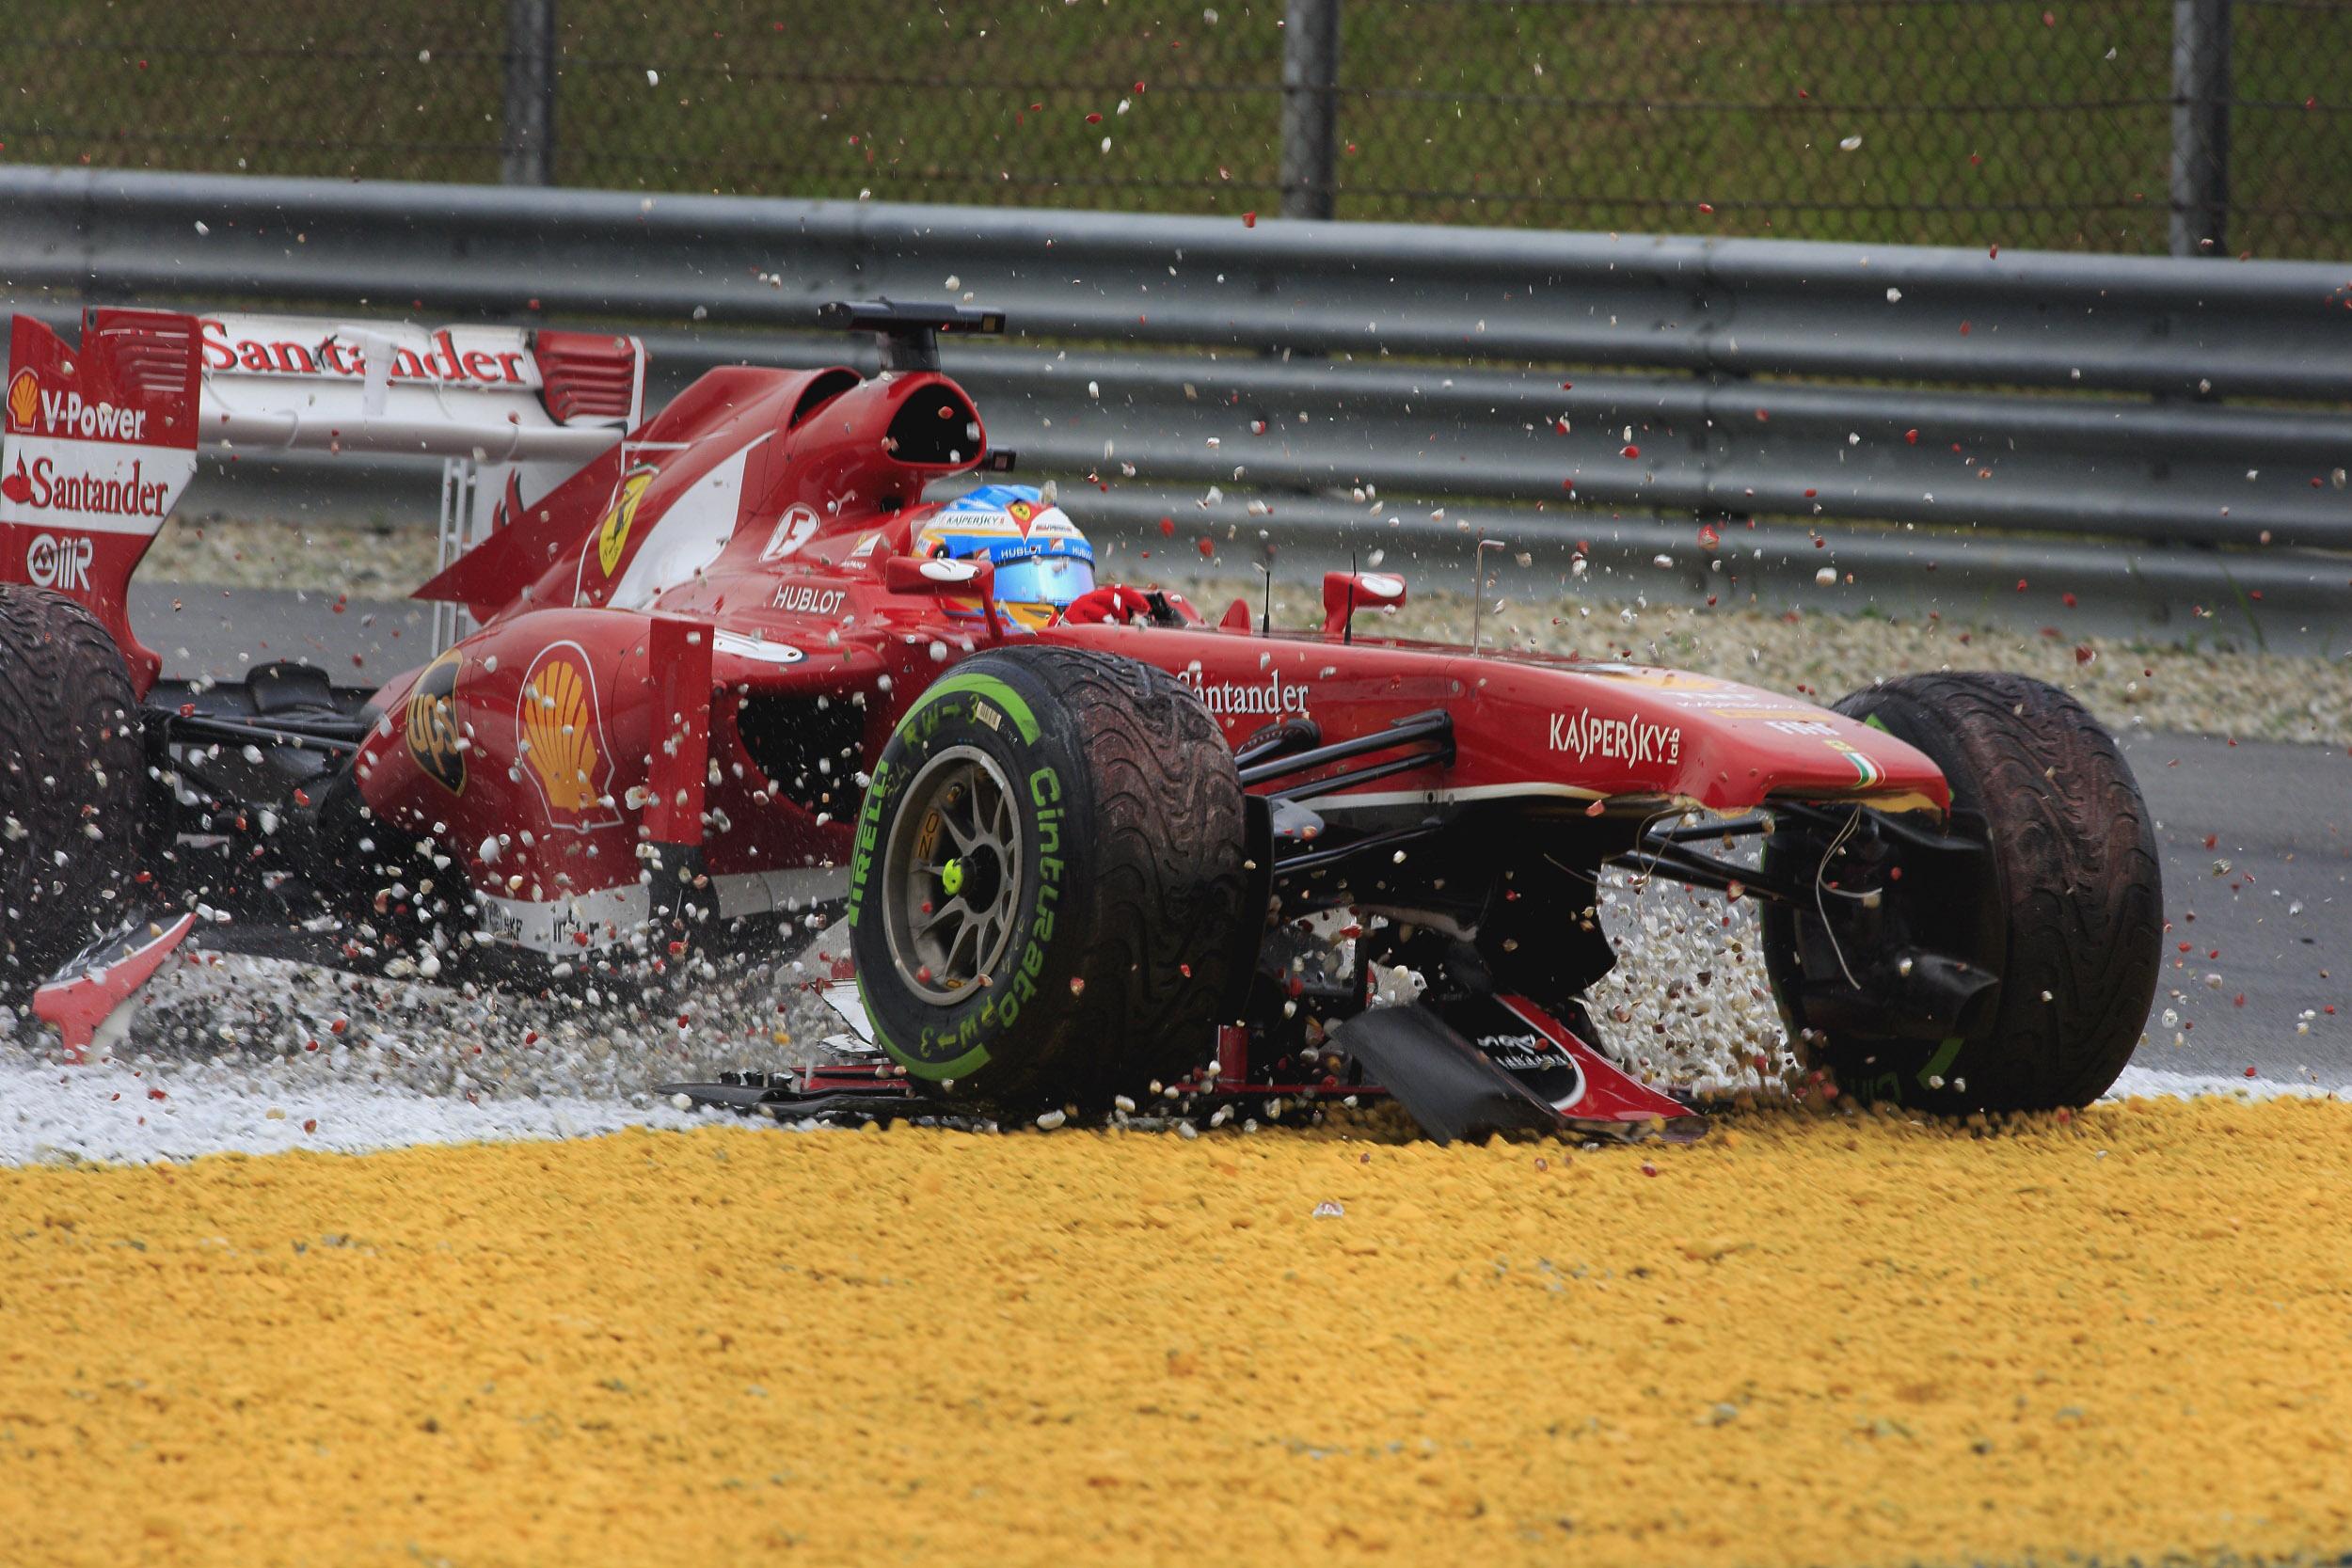 Alonso: Zmaga je bila dosegljiva